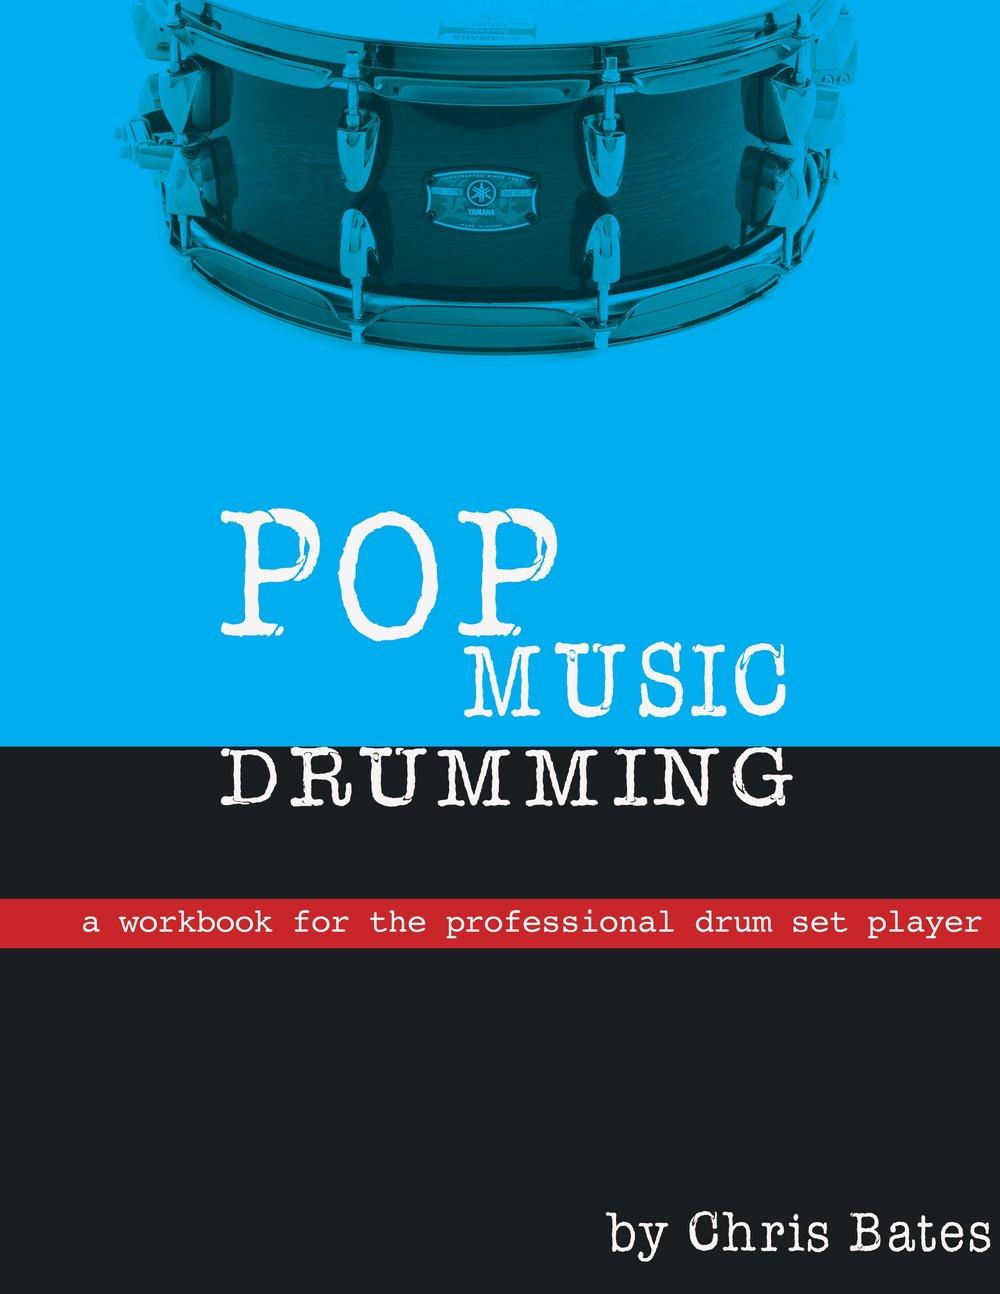 Pop Music Drumming